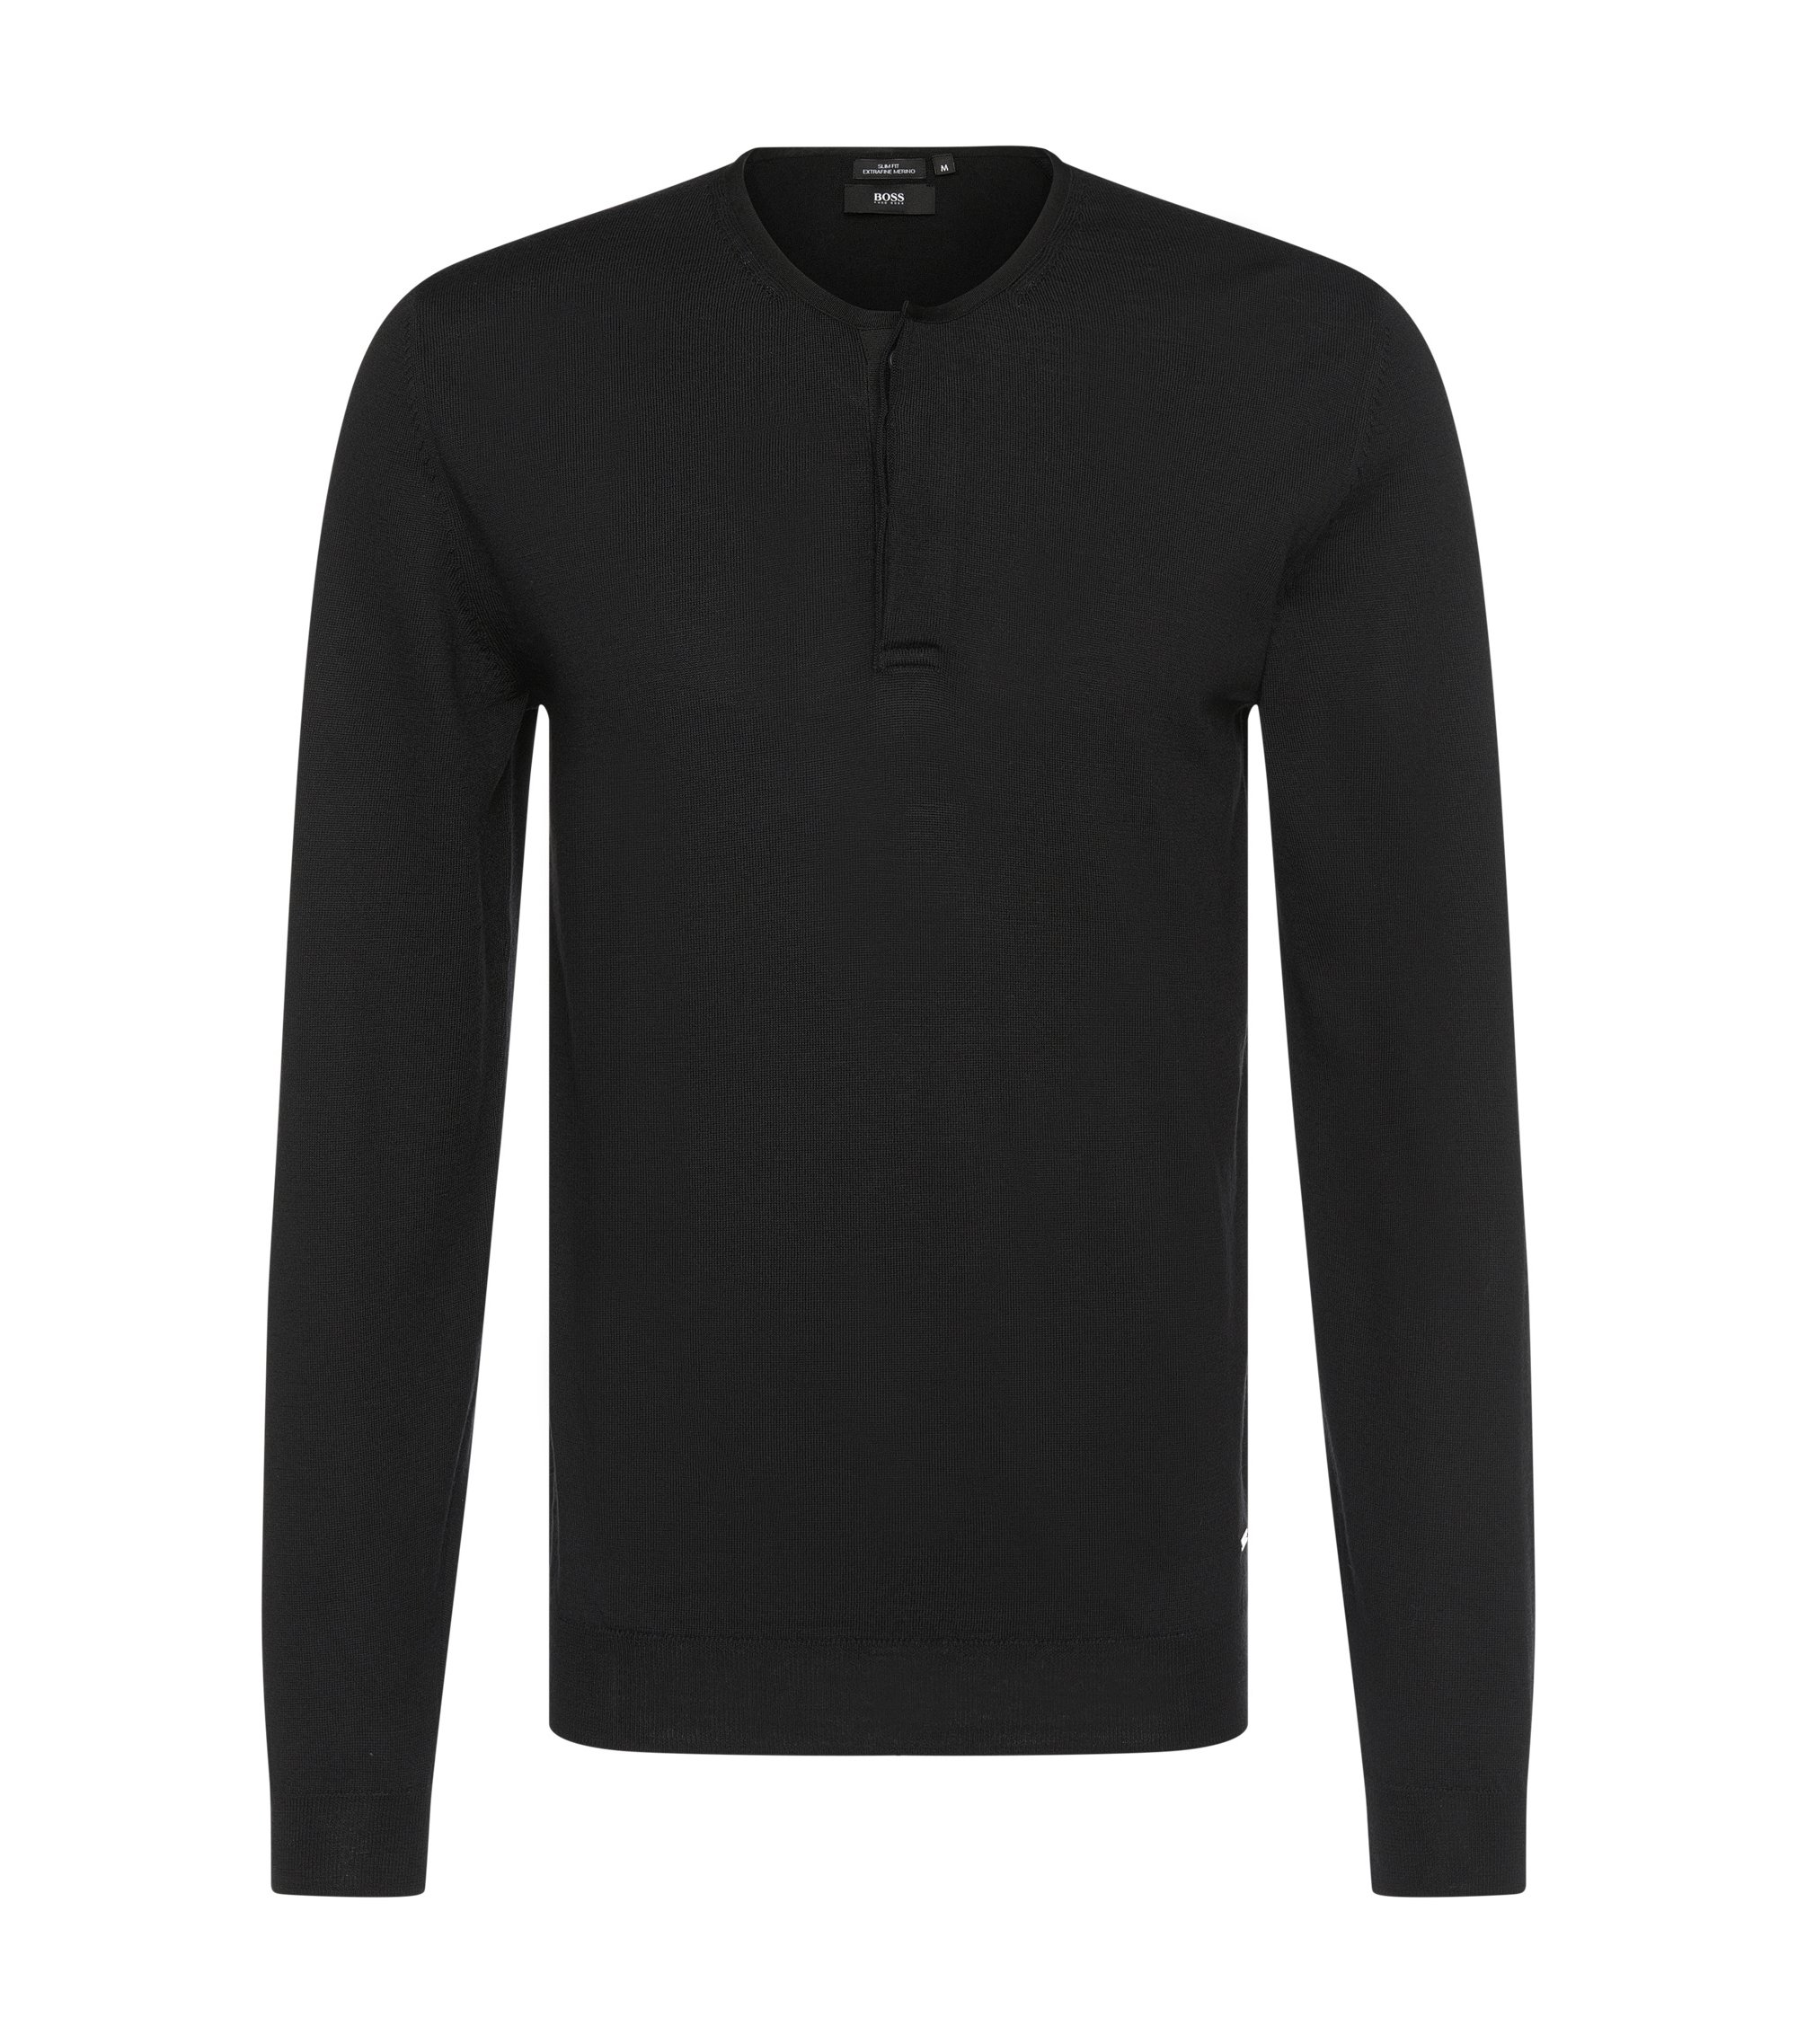 'Isaac' | Extra Fine Merino Virgin Wool Henley Sweater, Black